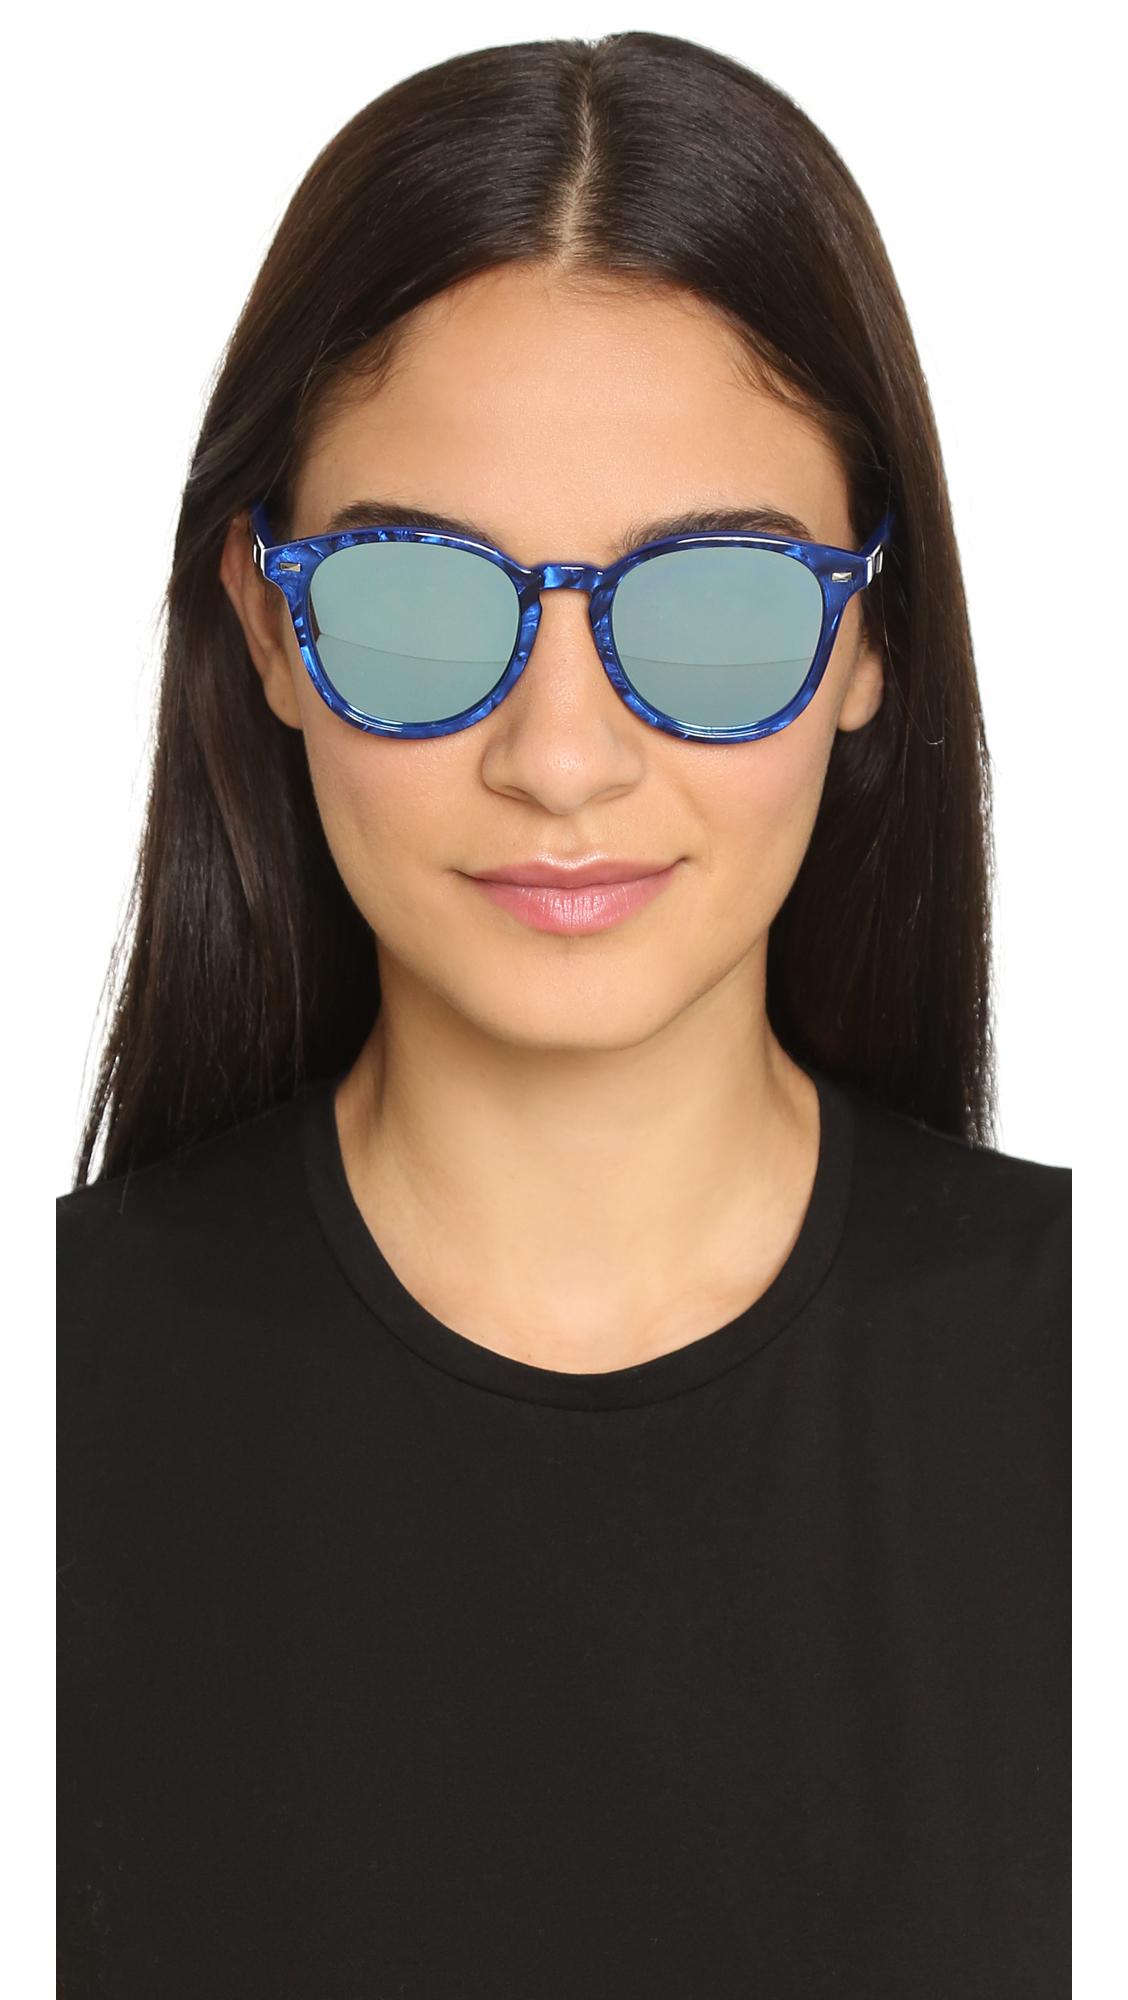 c60b896c10 Lyst - Le Specs Bandwagon Sunglasses - Cobalt Marble silver in Blue